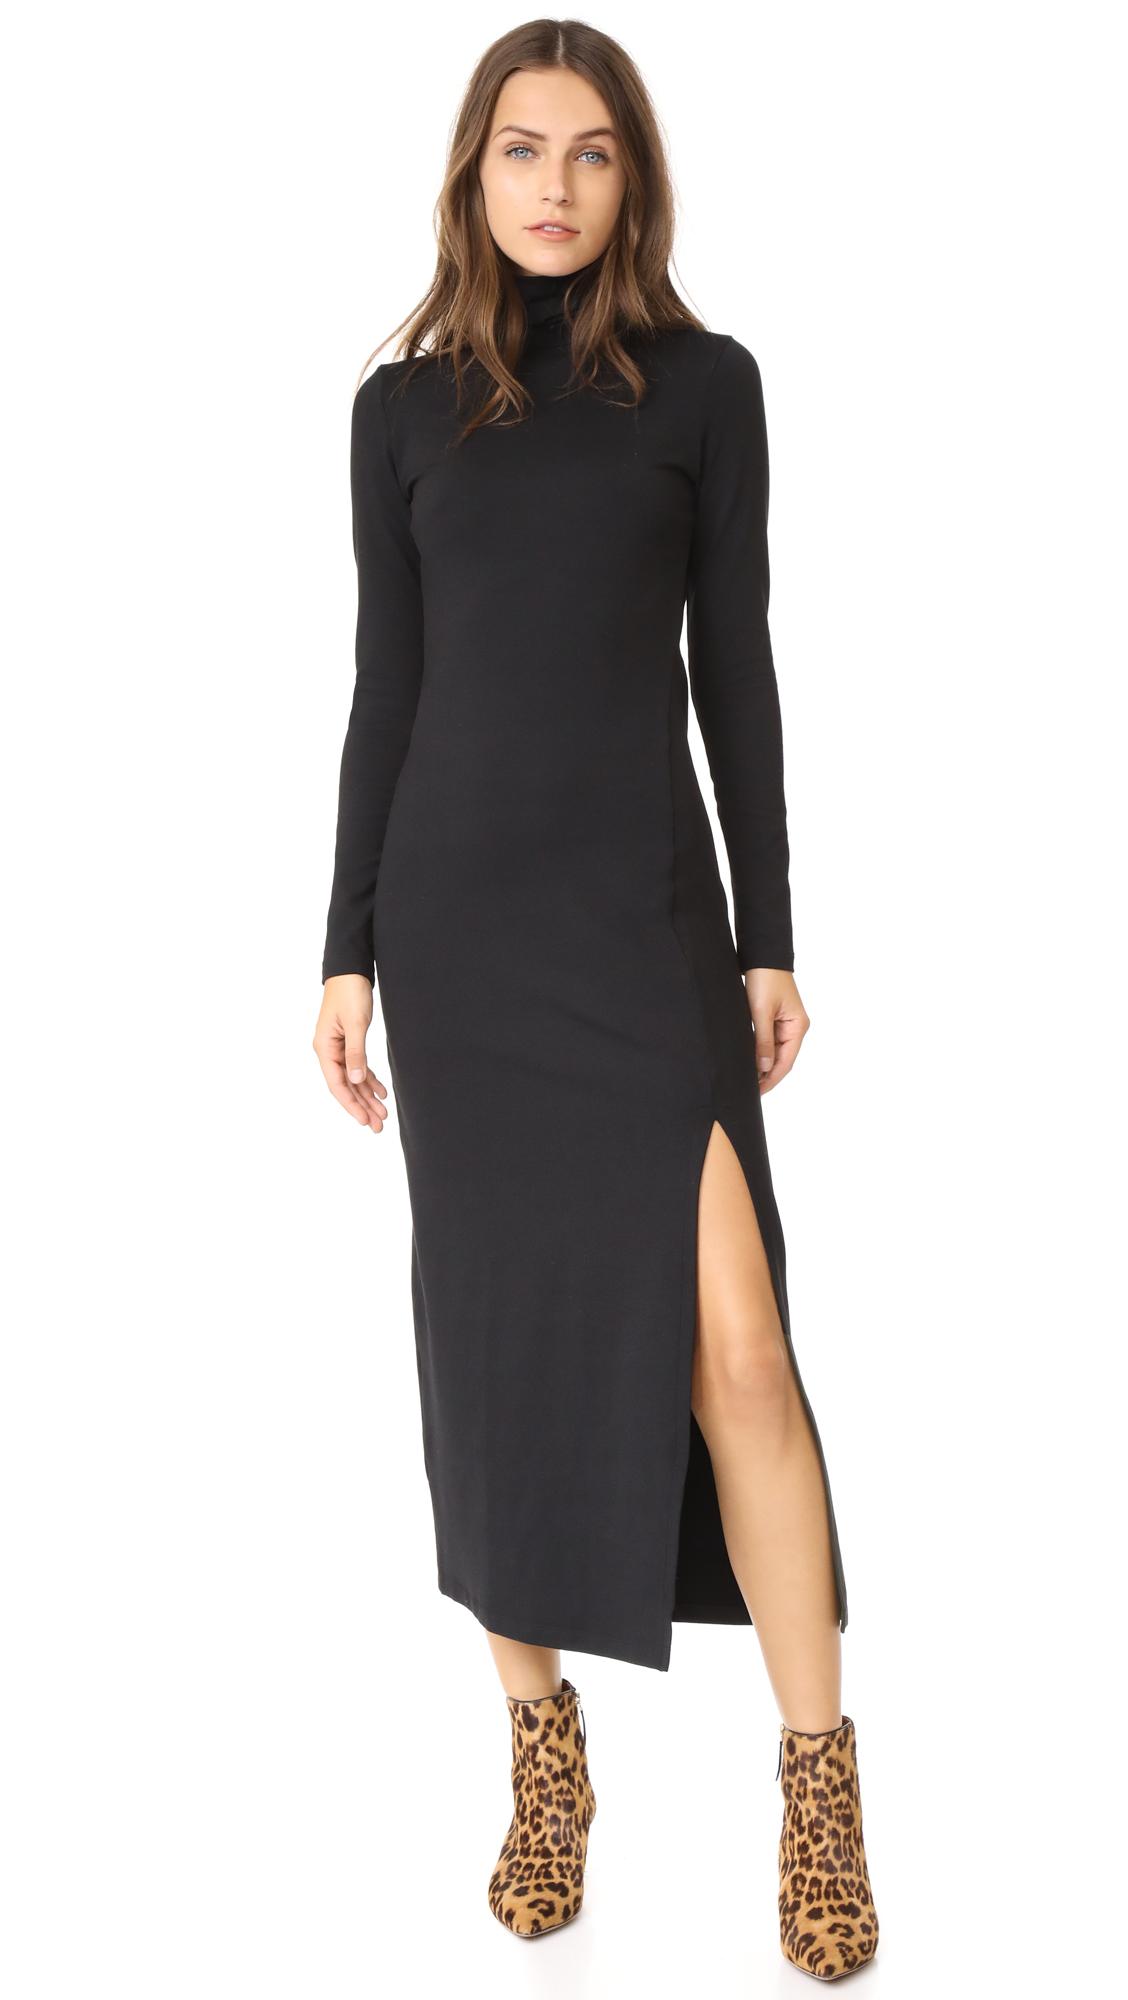 Susana Monaco Mina Dress - Black